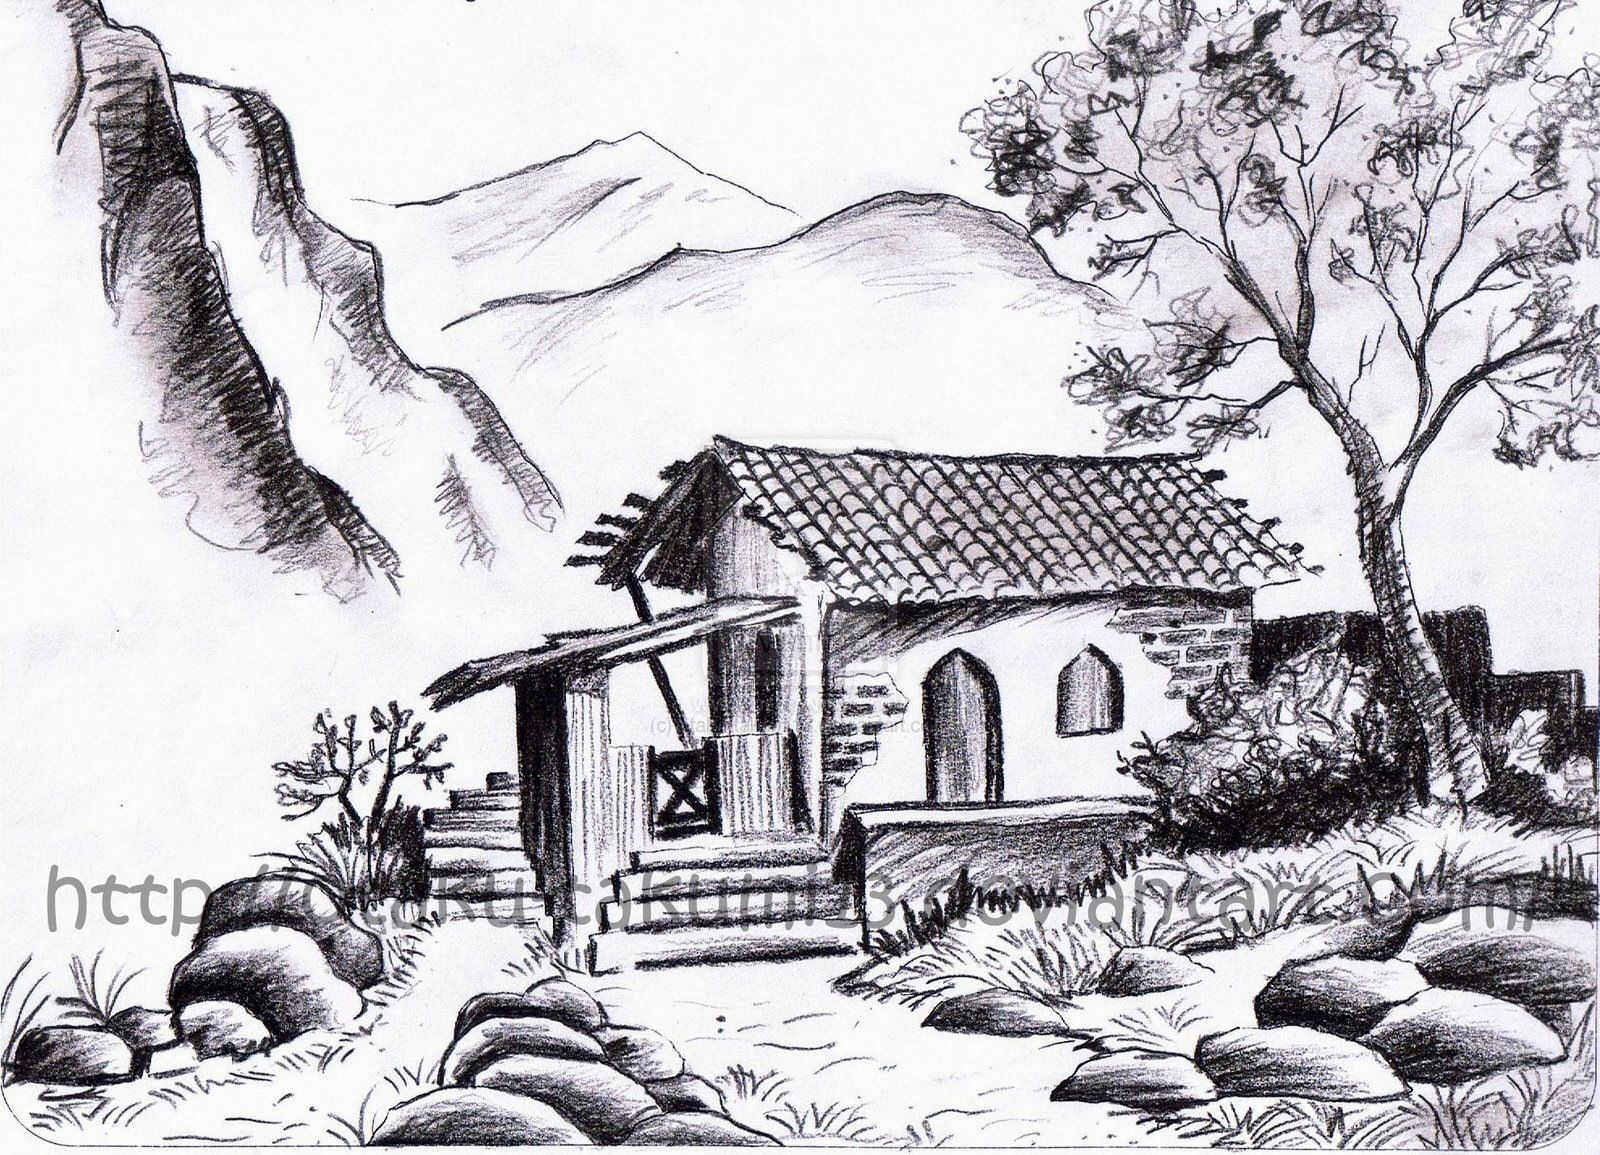 Pin By Kaitlyn Keim On Unique Art Ideas Landscape Pencil Drawings Drawing Scenery Landscape Drawings